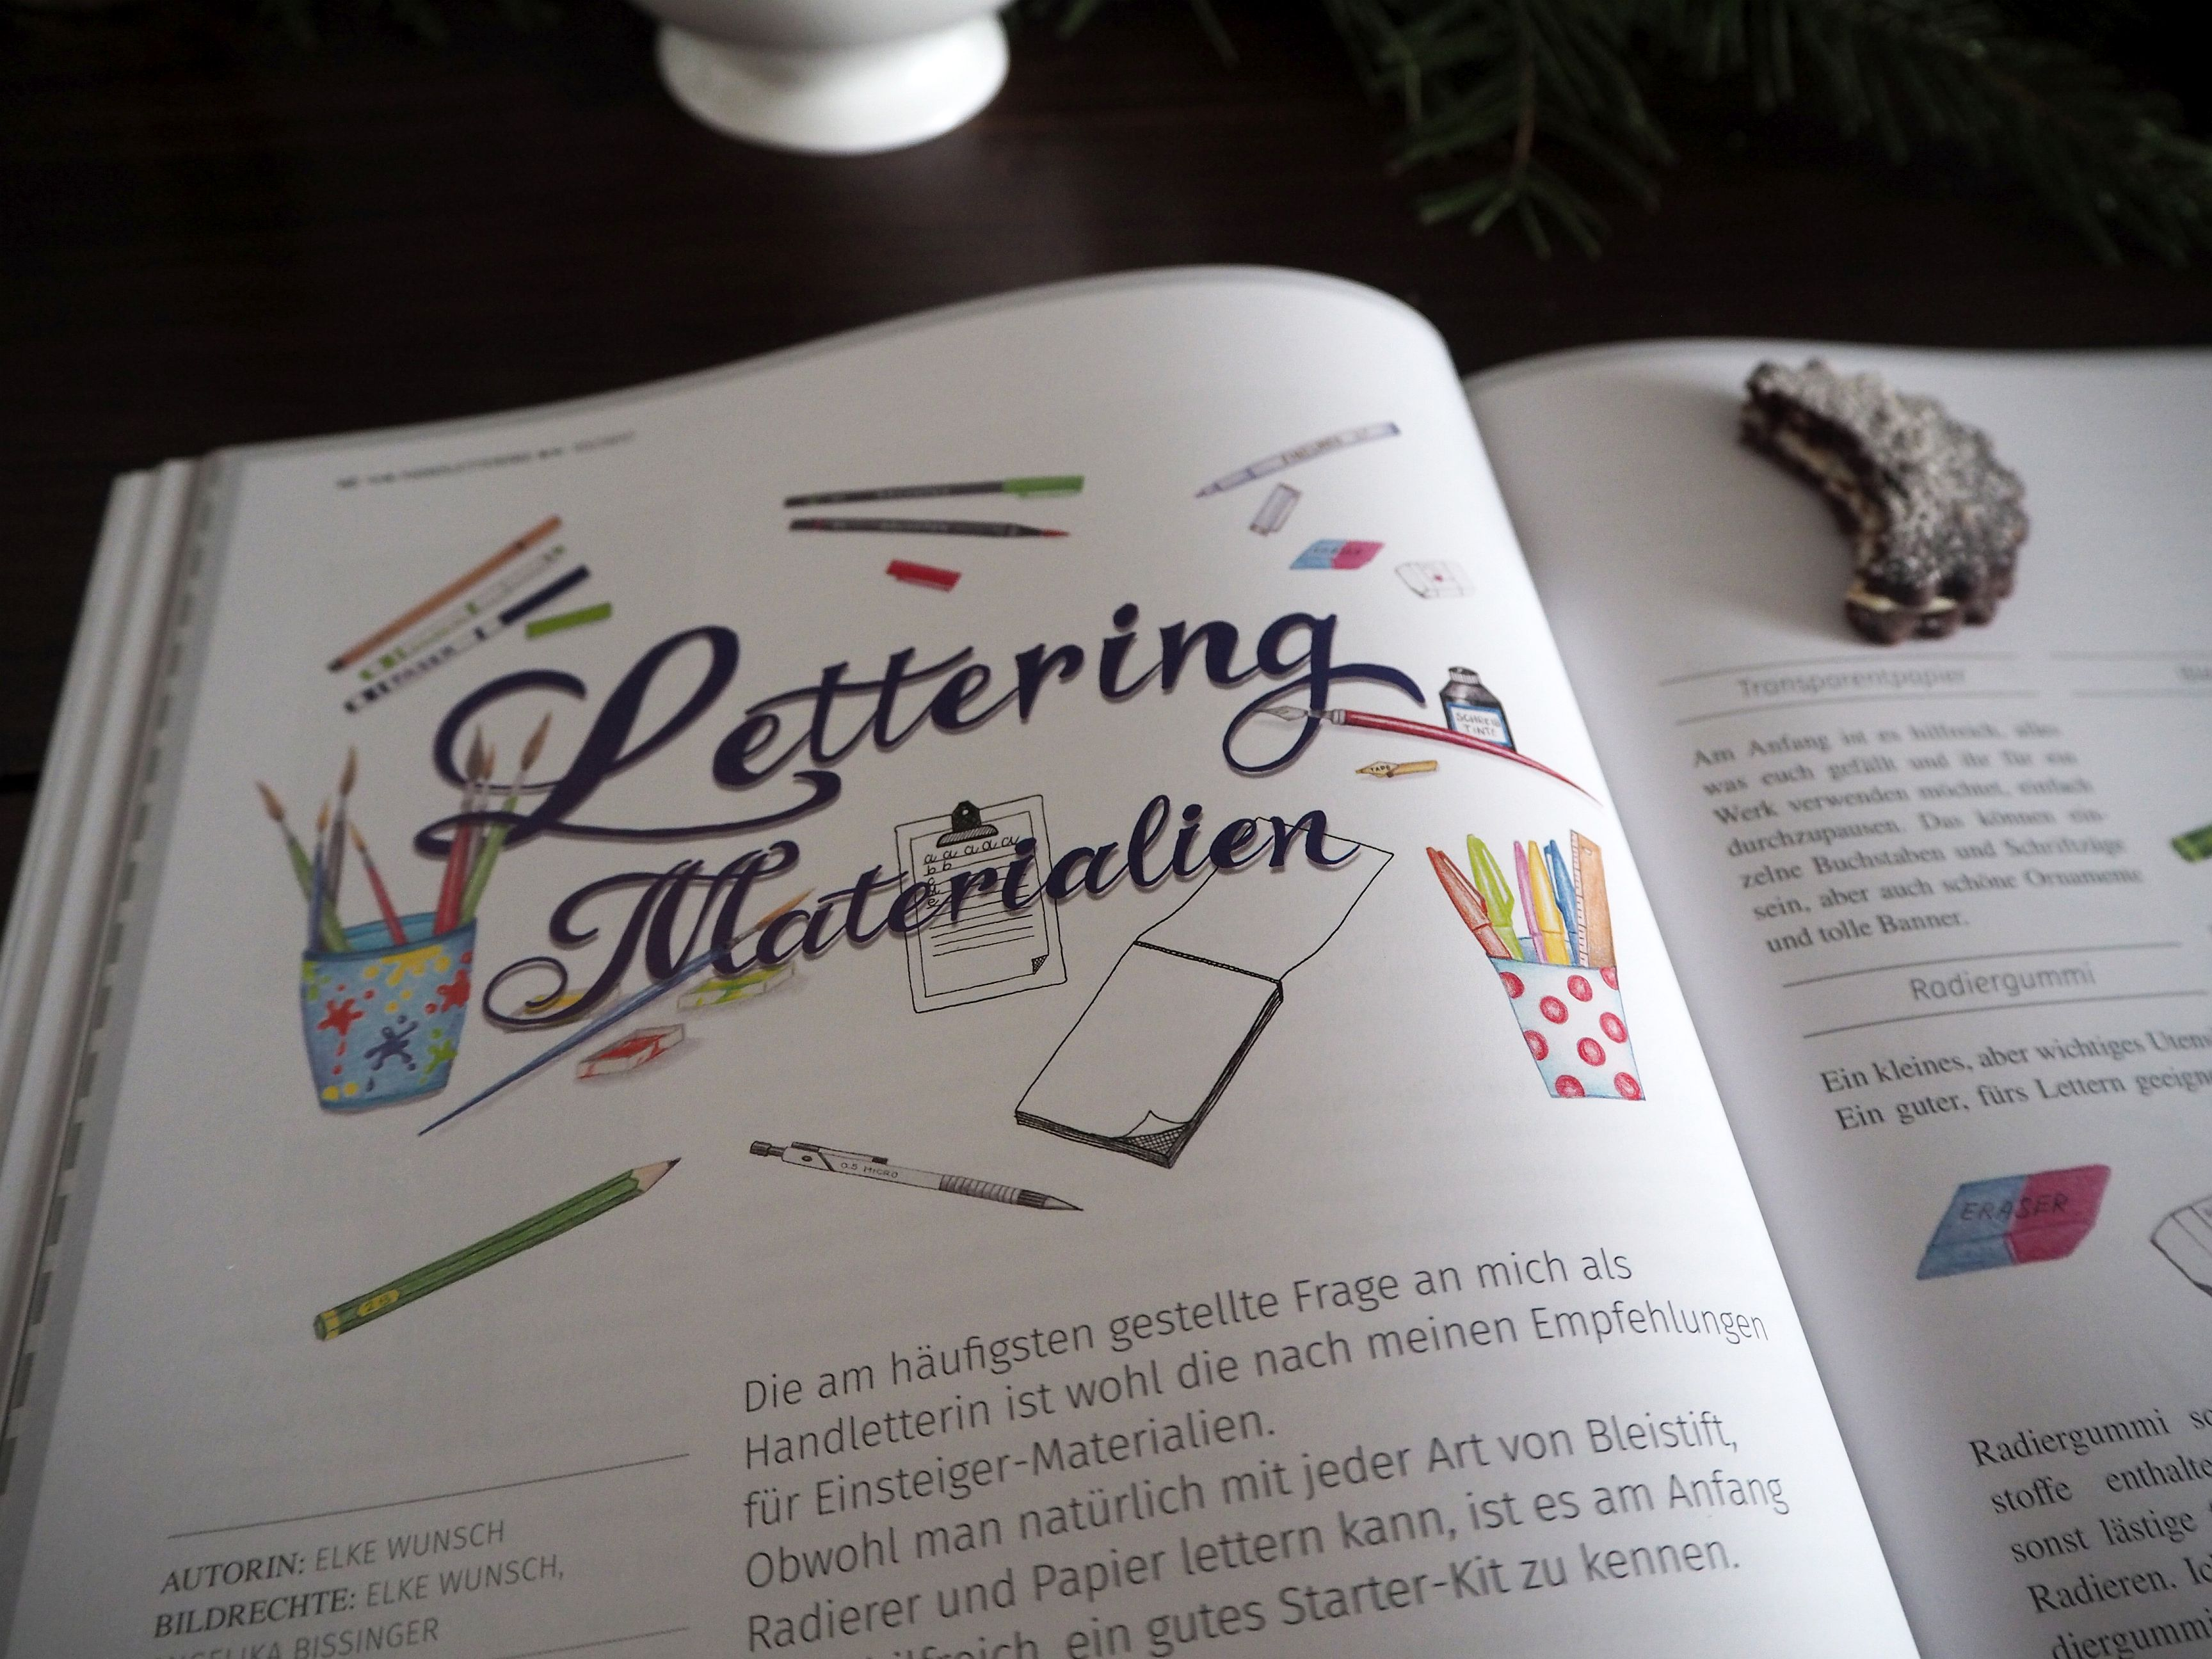 2017-12-skoen-och-kreativ-sonntagslektuere-zeitschrift-kalligrafie-aktuell (11)